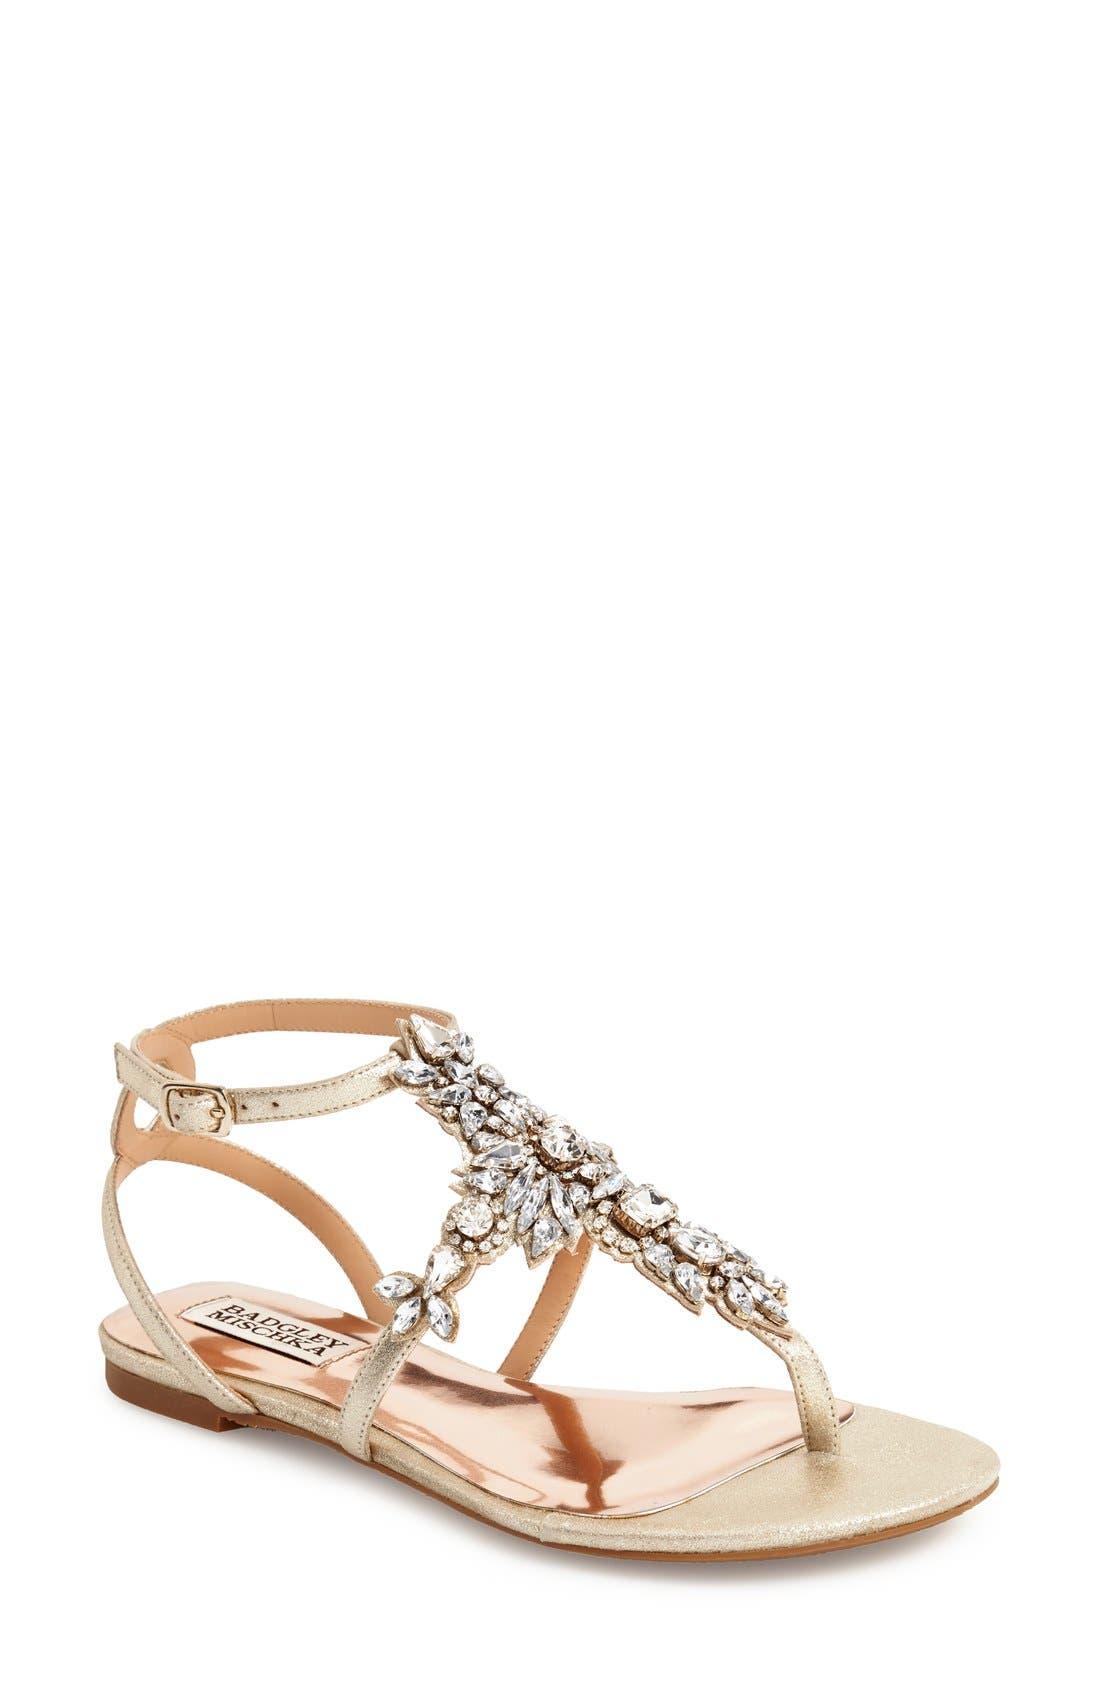 Badgley Mischka 'Cara' Crystal Embellished Flat Sandal,                             Main thumbnail 1, color,                             710